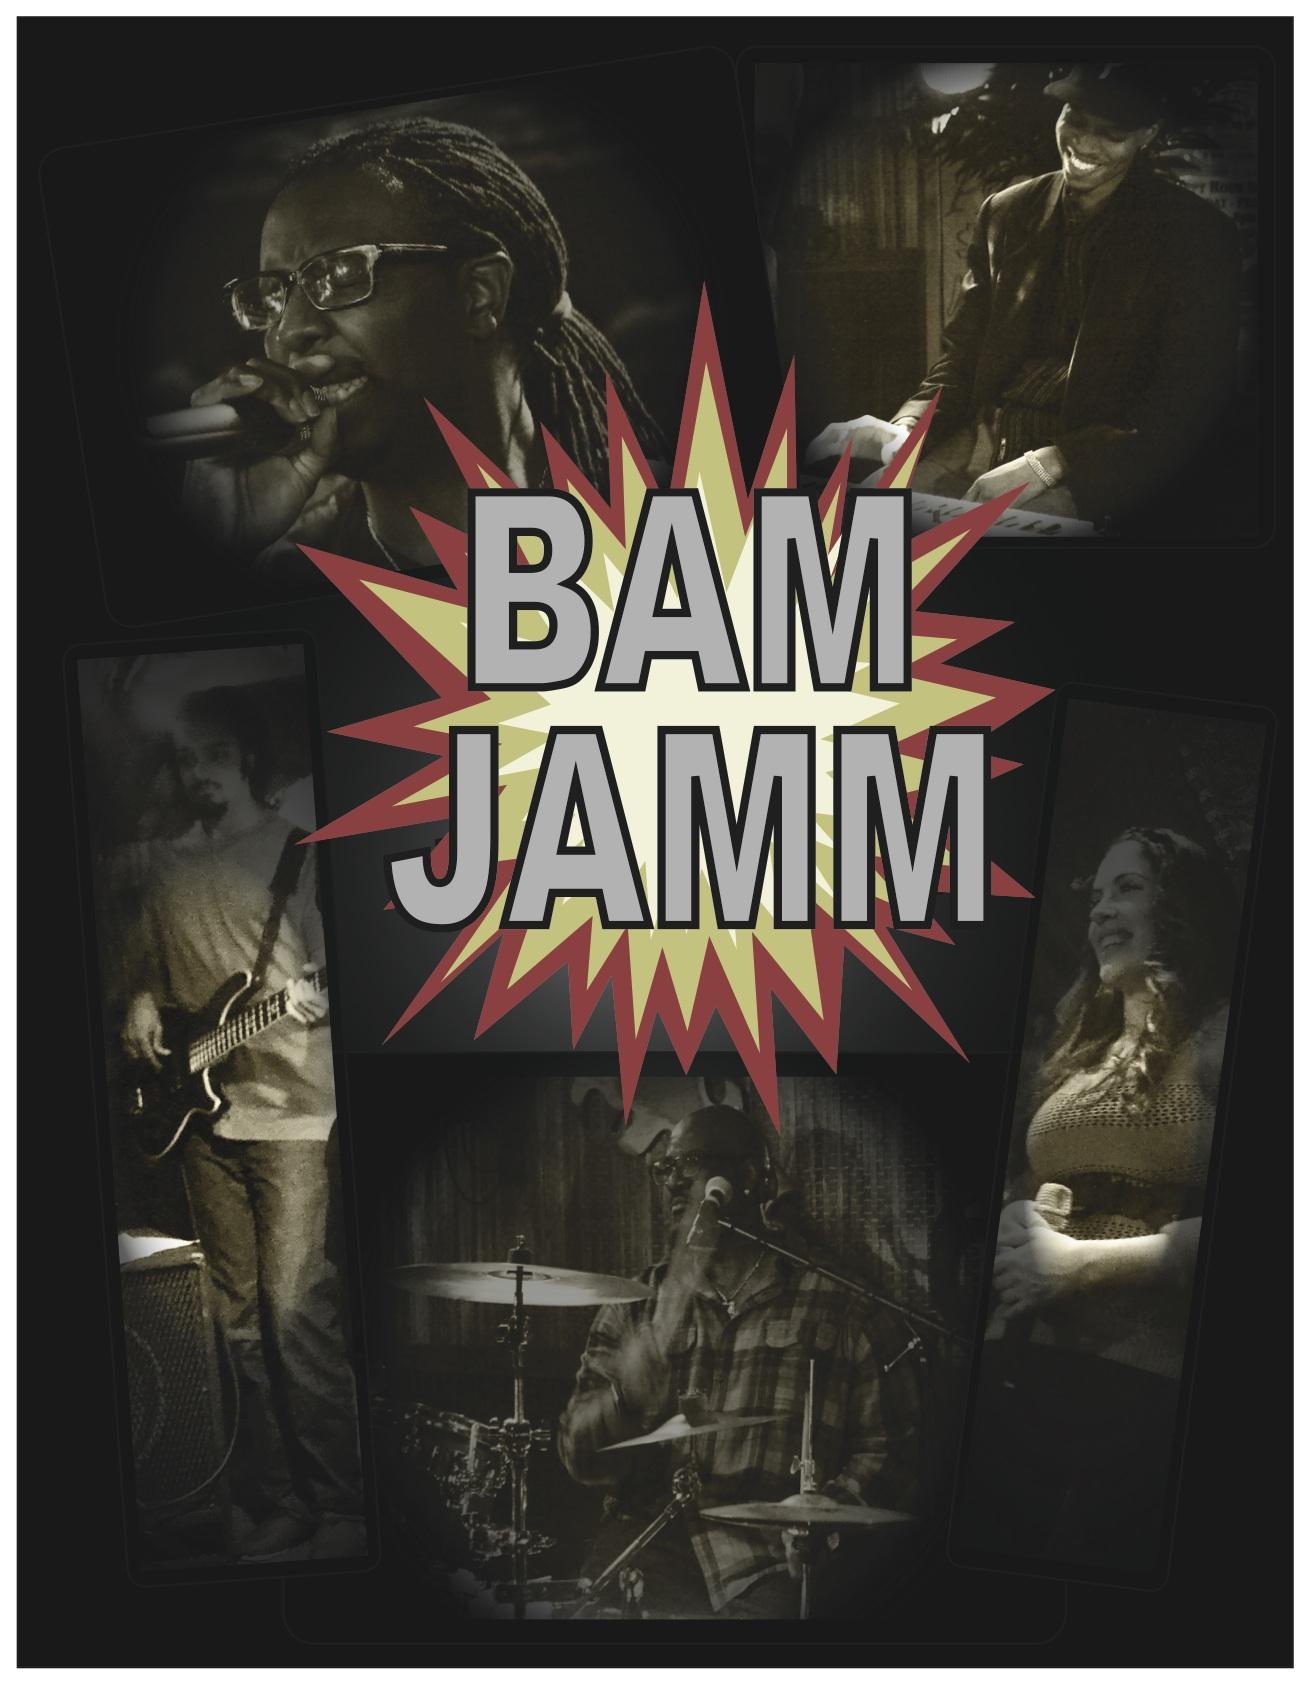 Bam Jamm